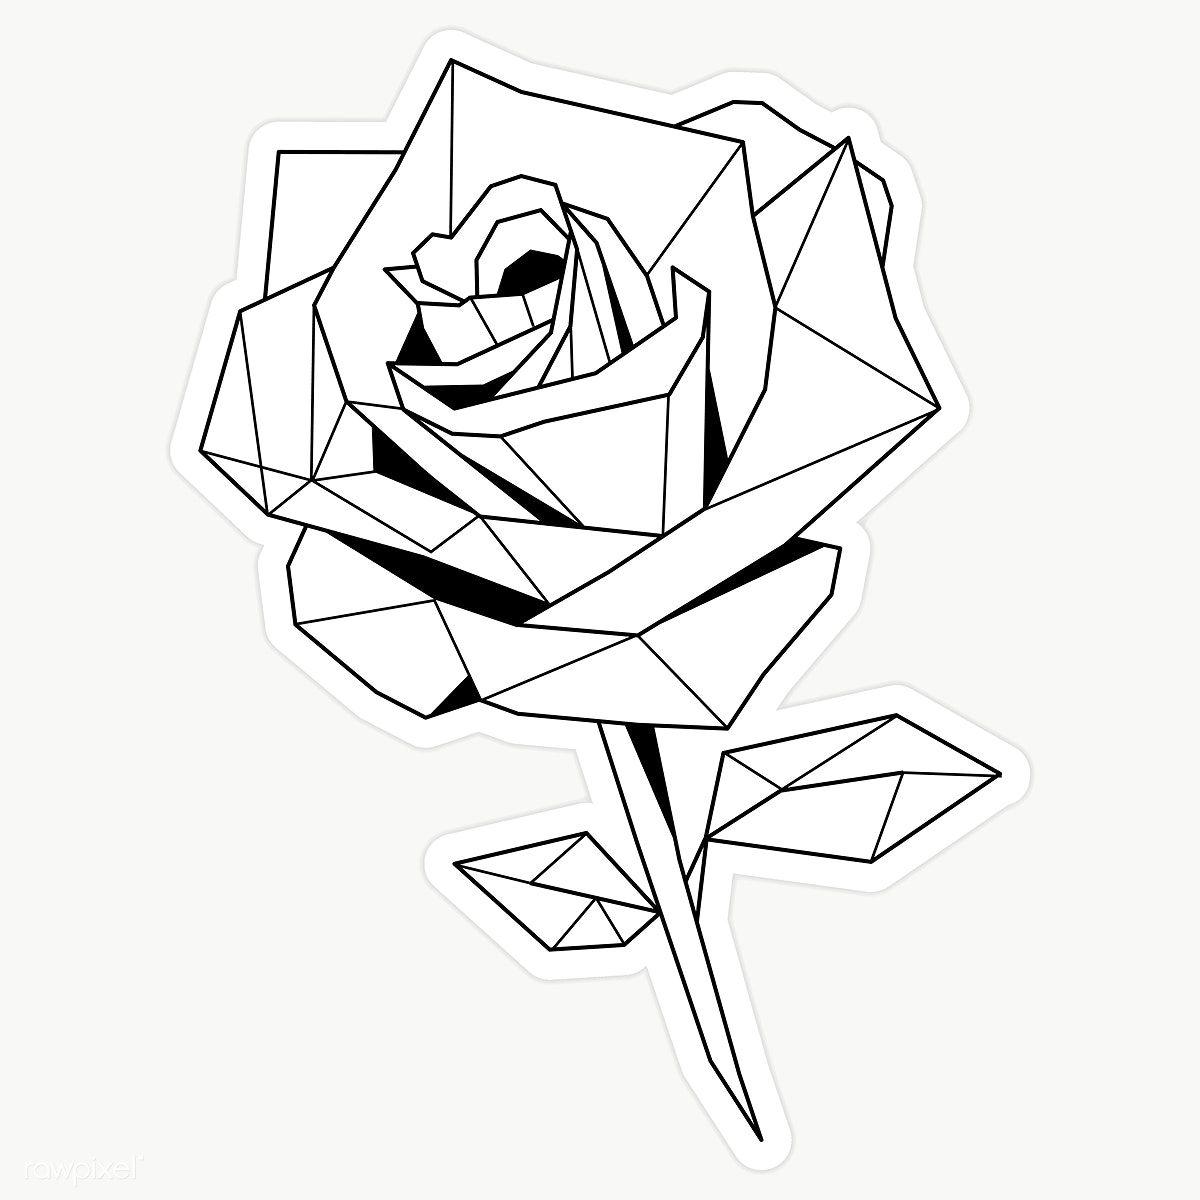 Black And White Rose Sticker Transparent Png Premium Image By Rawpixel Com Sasi Vector Pegatinas Bonitas Tatuajes Falsos Decoracion De Arte De La Pared